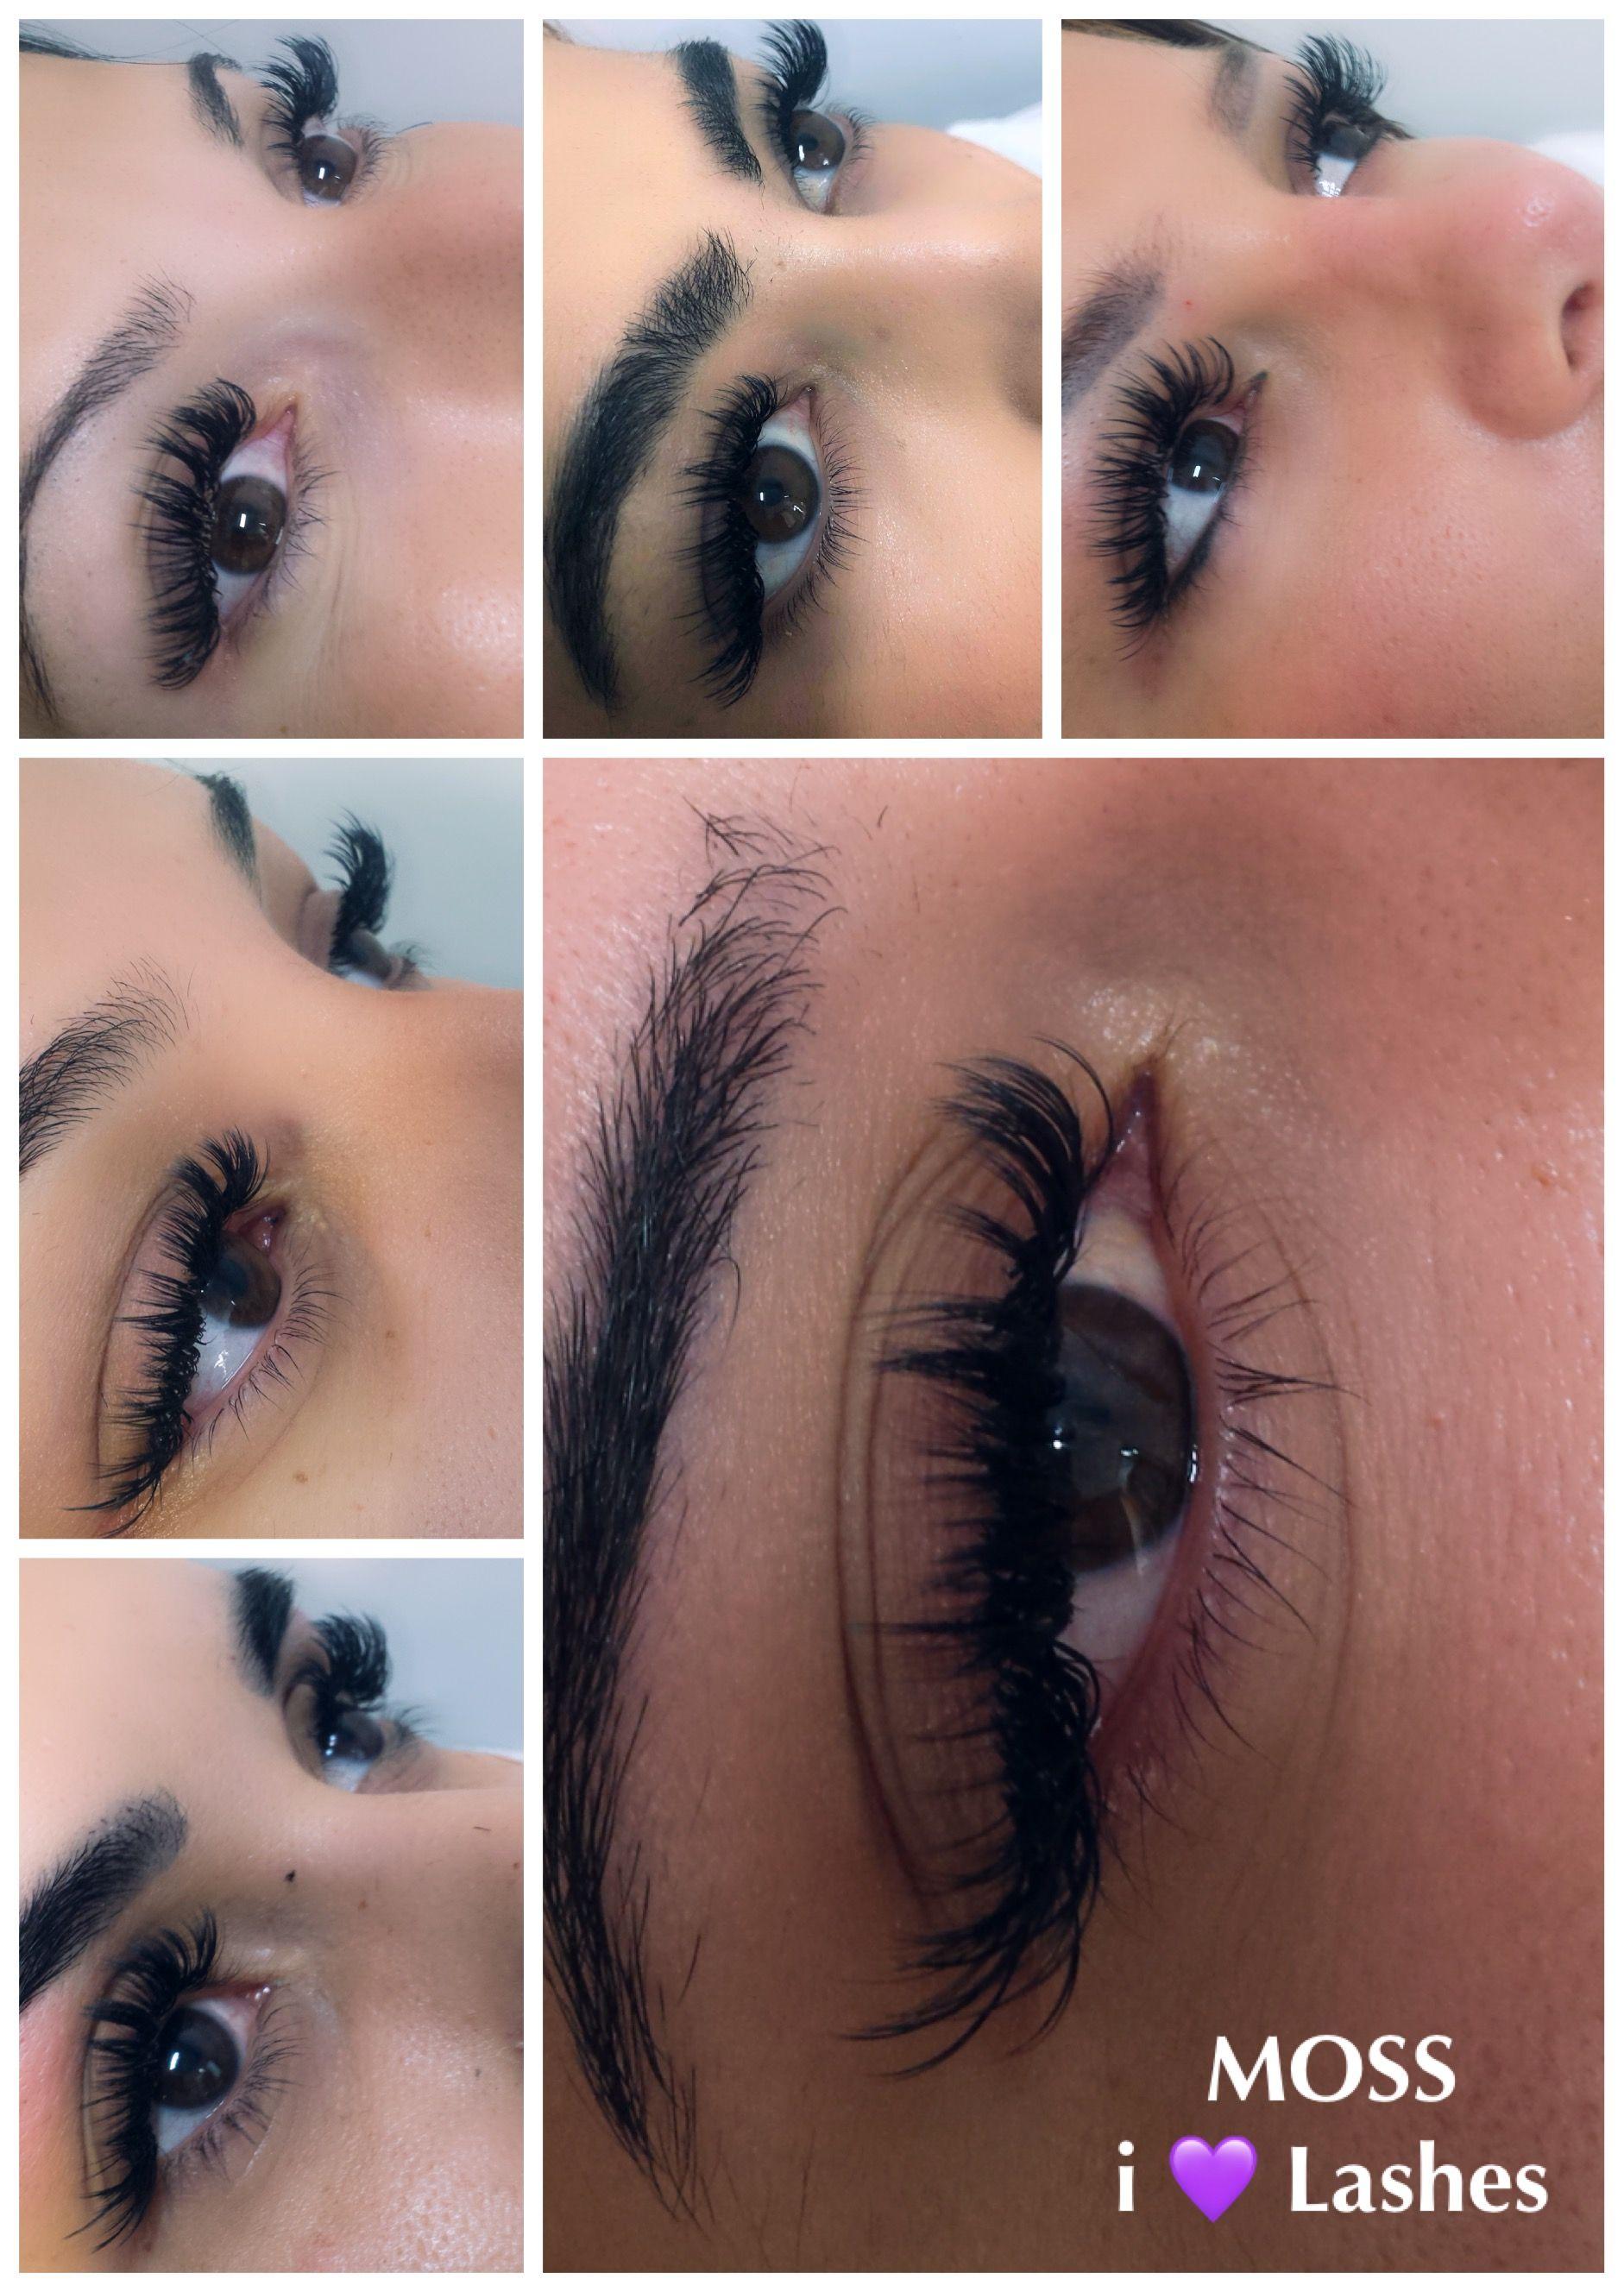 Perfect Eyelash Extensions I Lashes Moss Eyelash Extensions